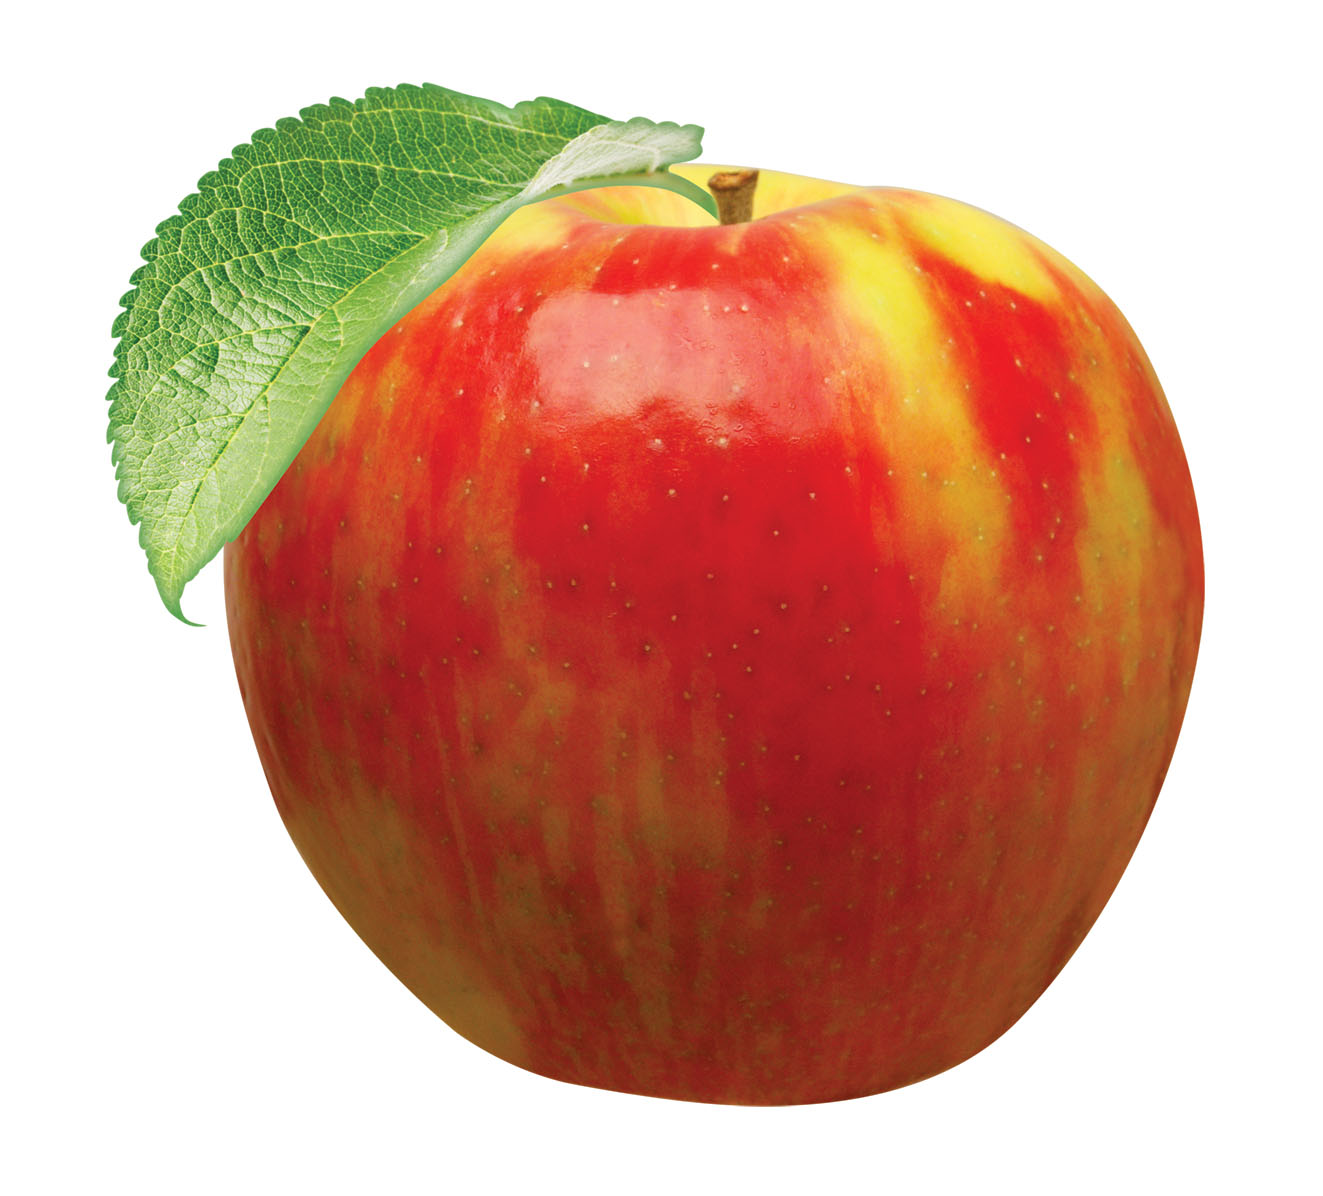 Honeycrisp apples by Chelan Fresh